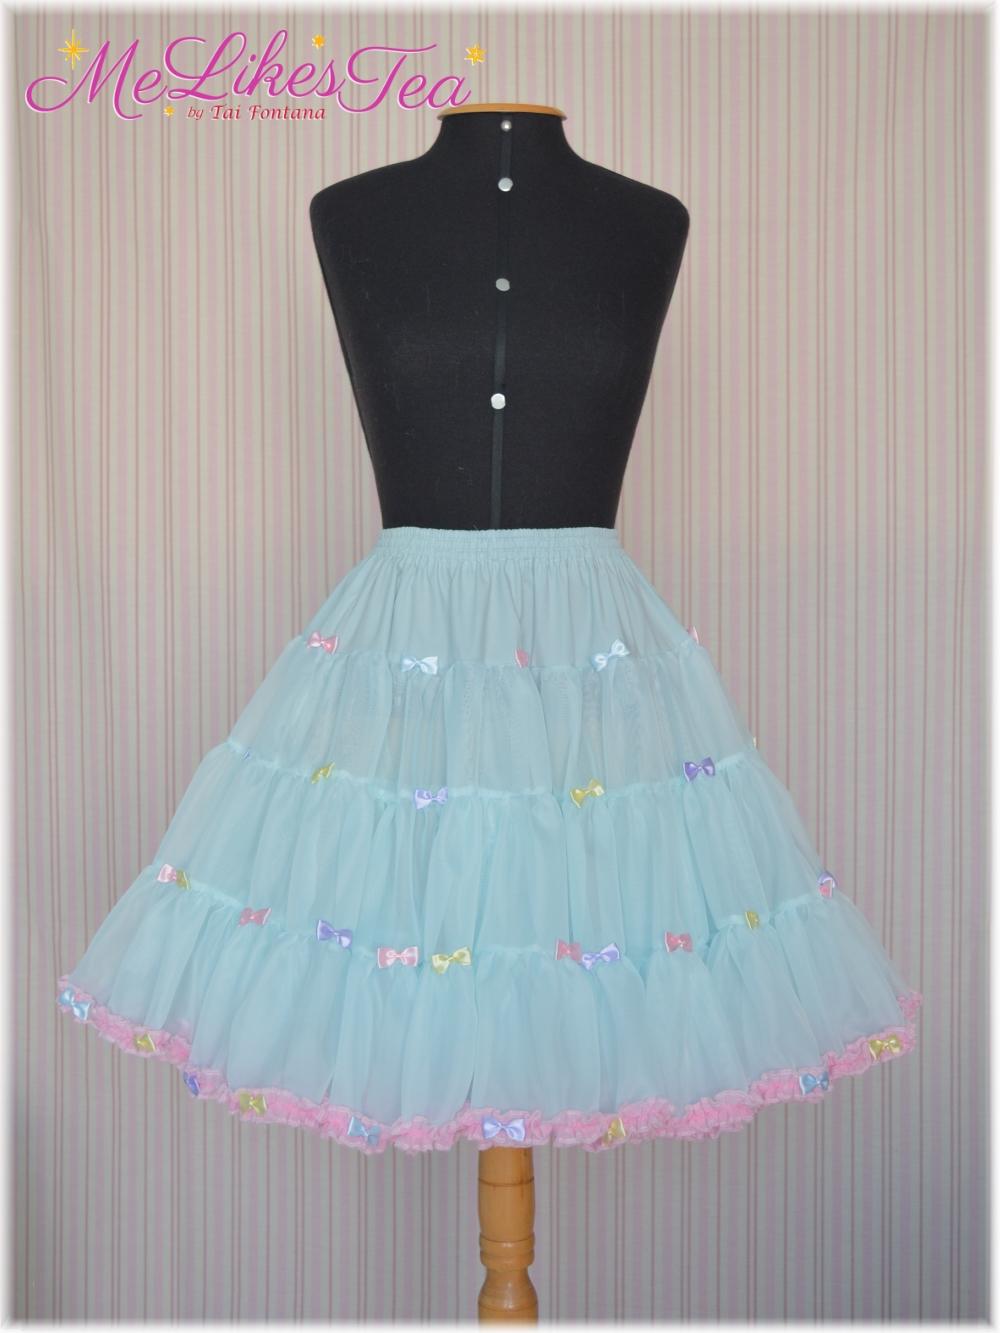 Petticoats online shopping